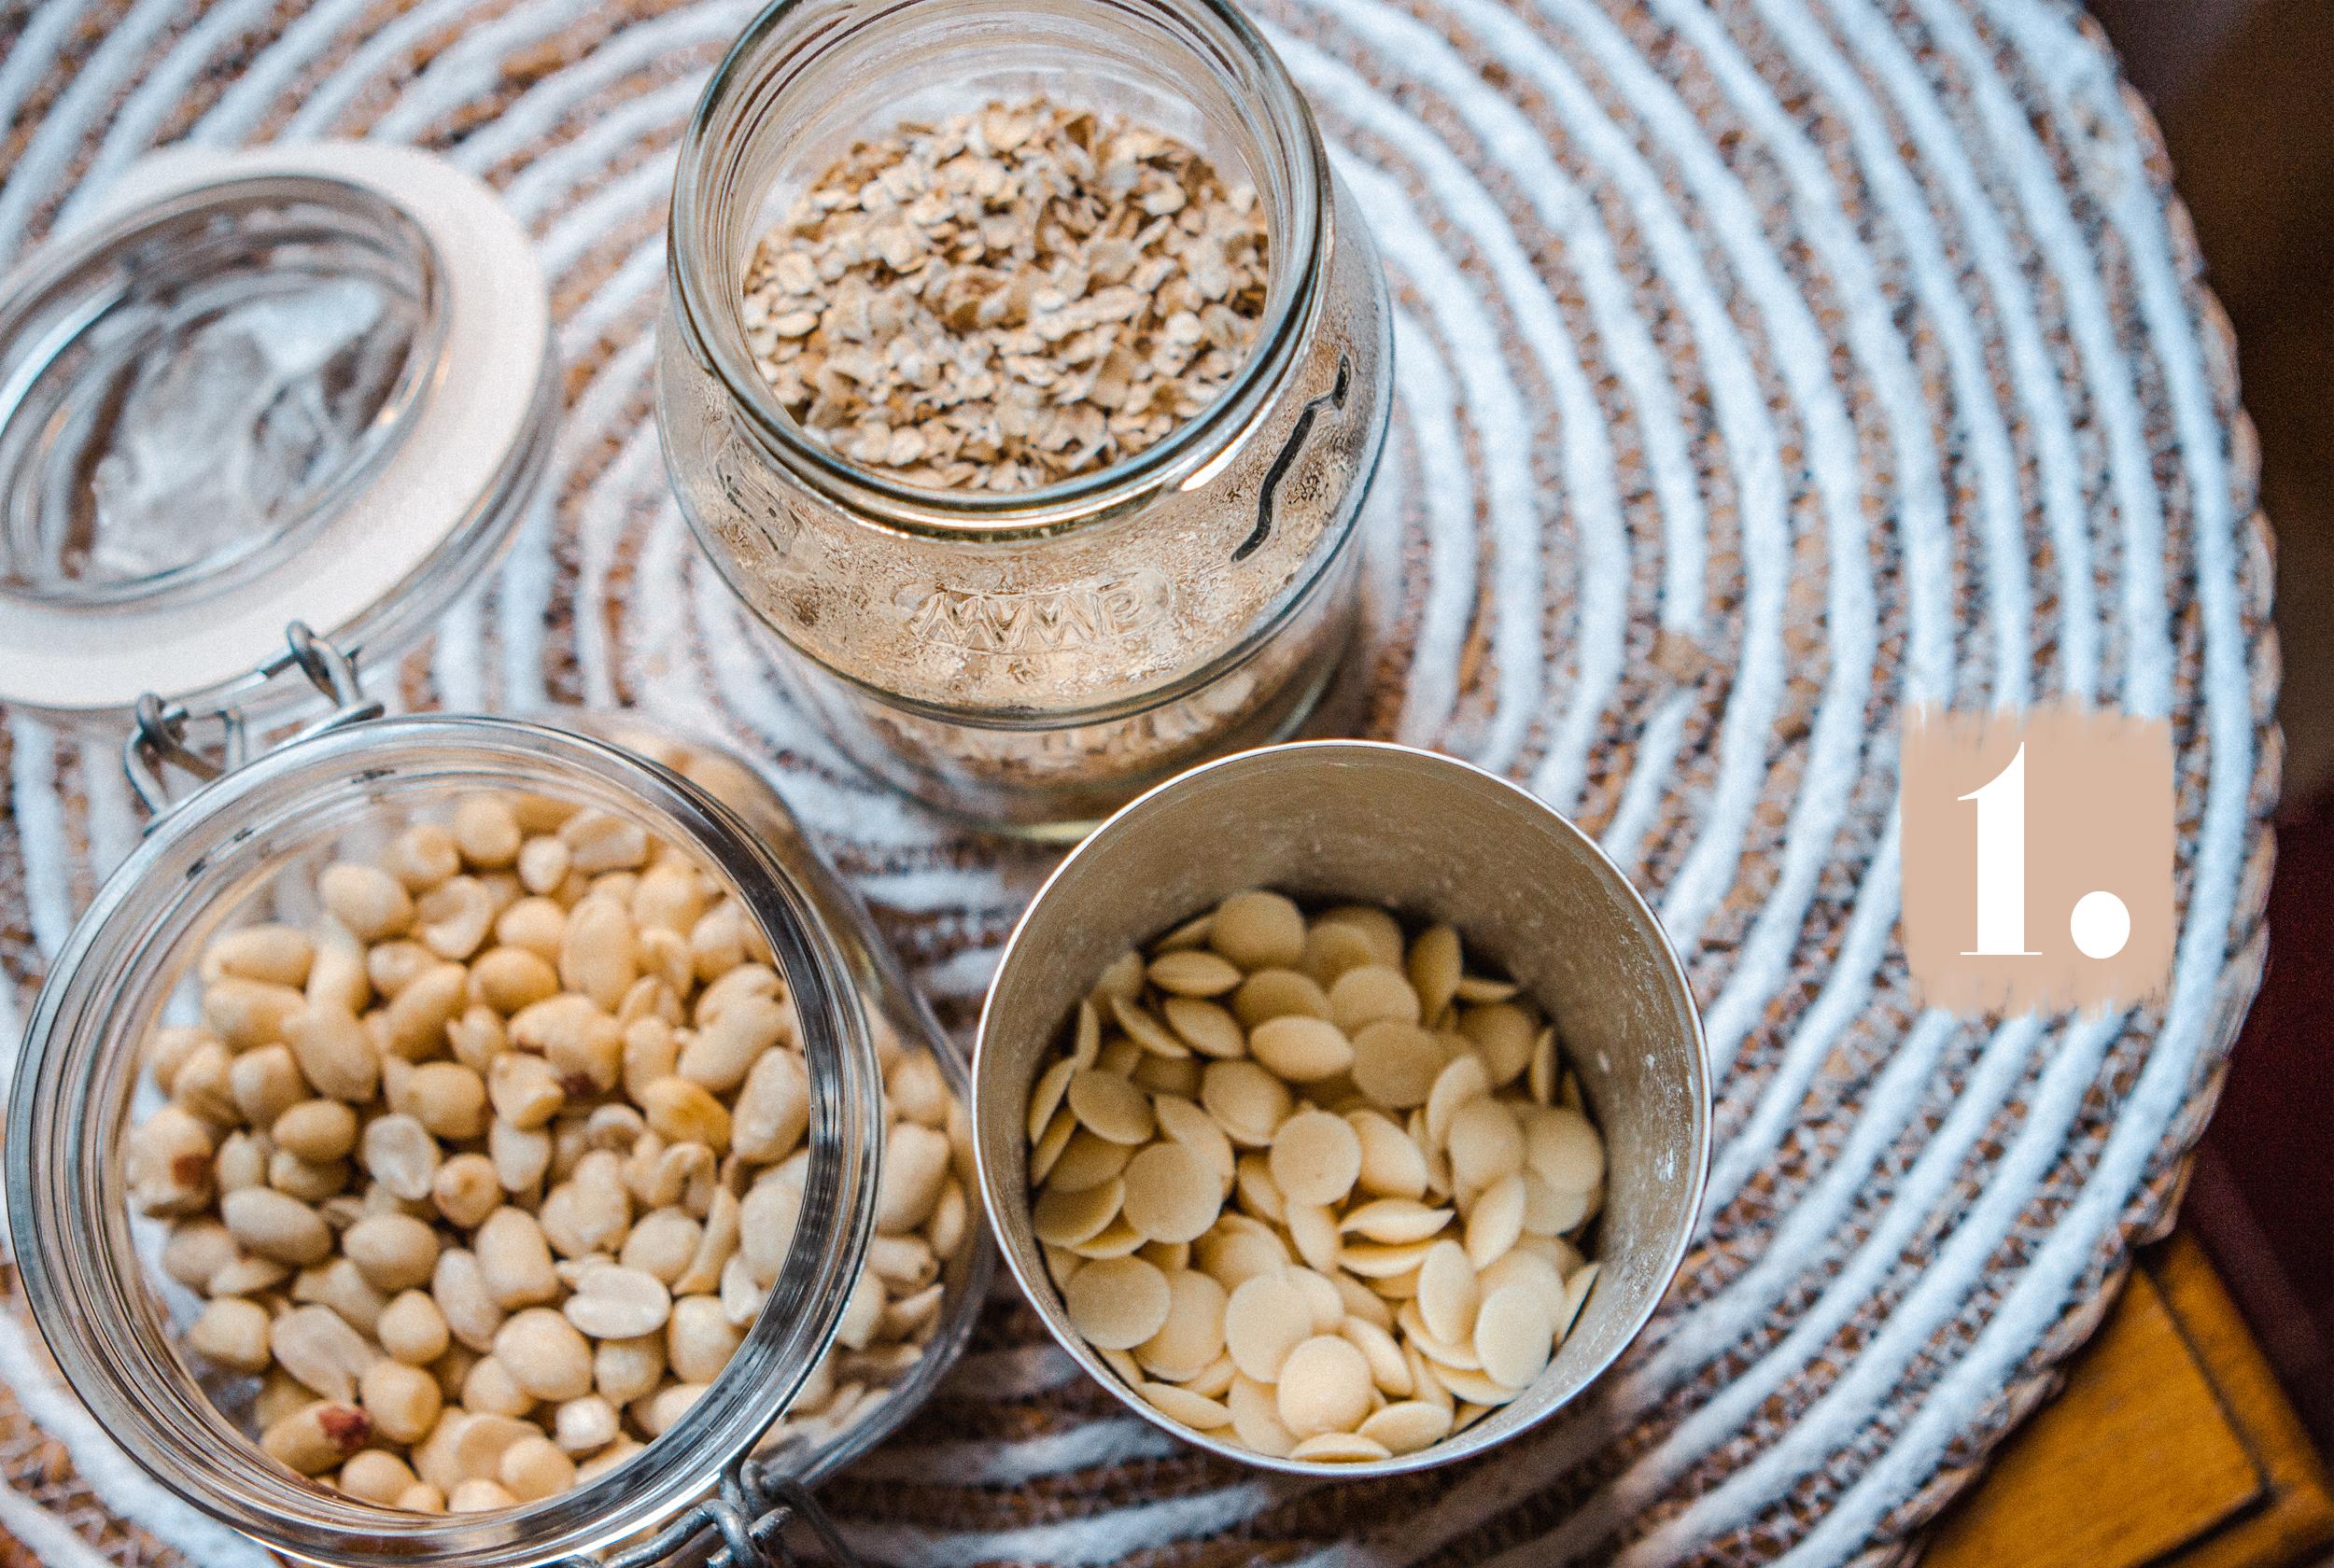 lauralamode-müsli-granola-vegan-healthy-no sugar-sugarfree-zuckerfrei-backen-crunchy müsli-crunchy granola-breakfast-recipe-rezept-foodblogger-fitnessblogger-berlin